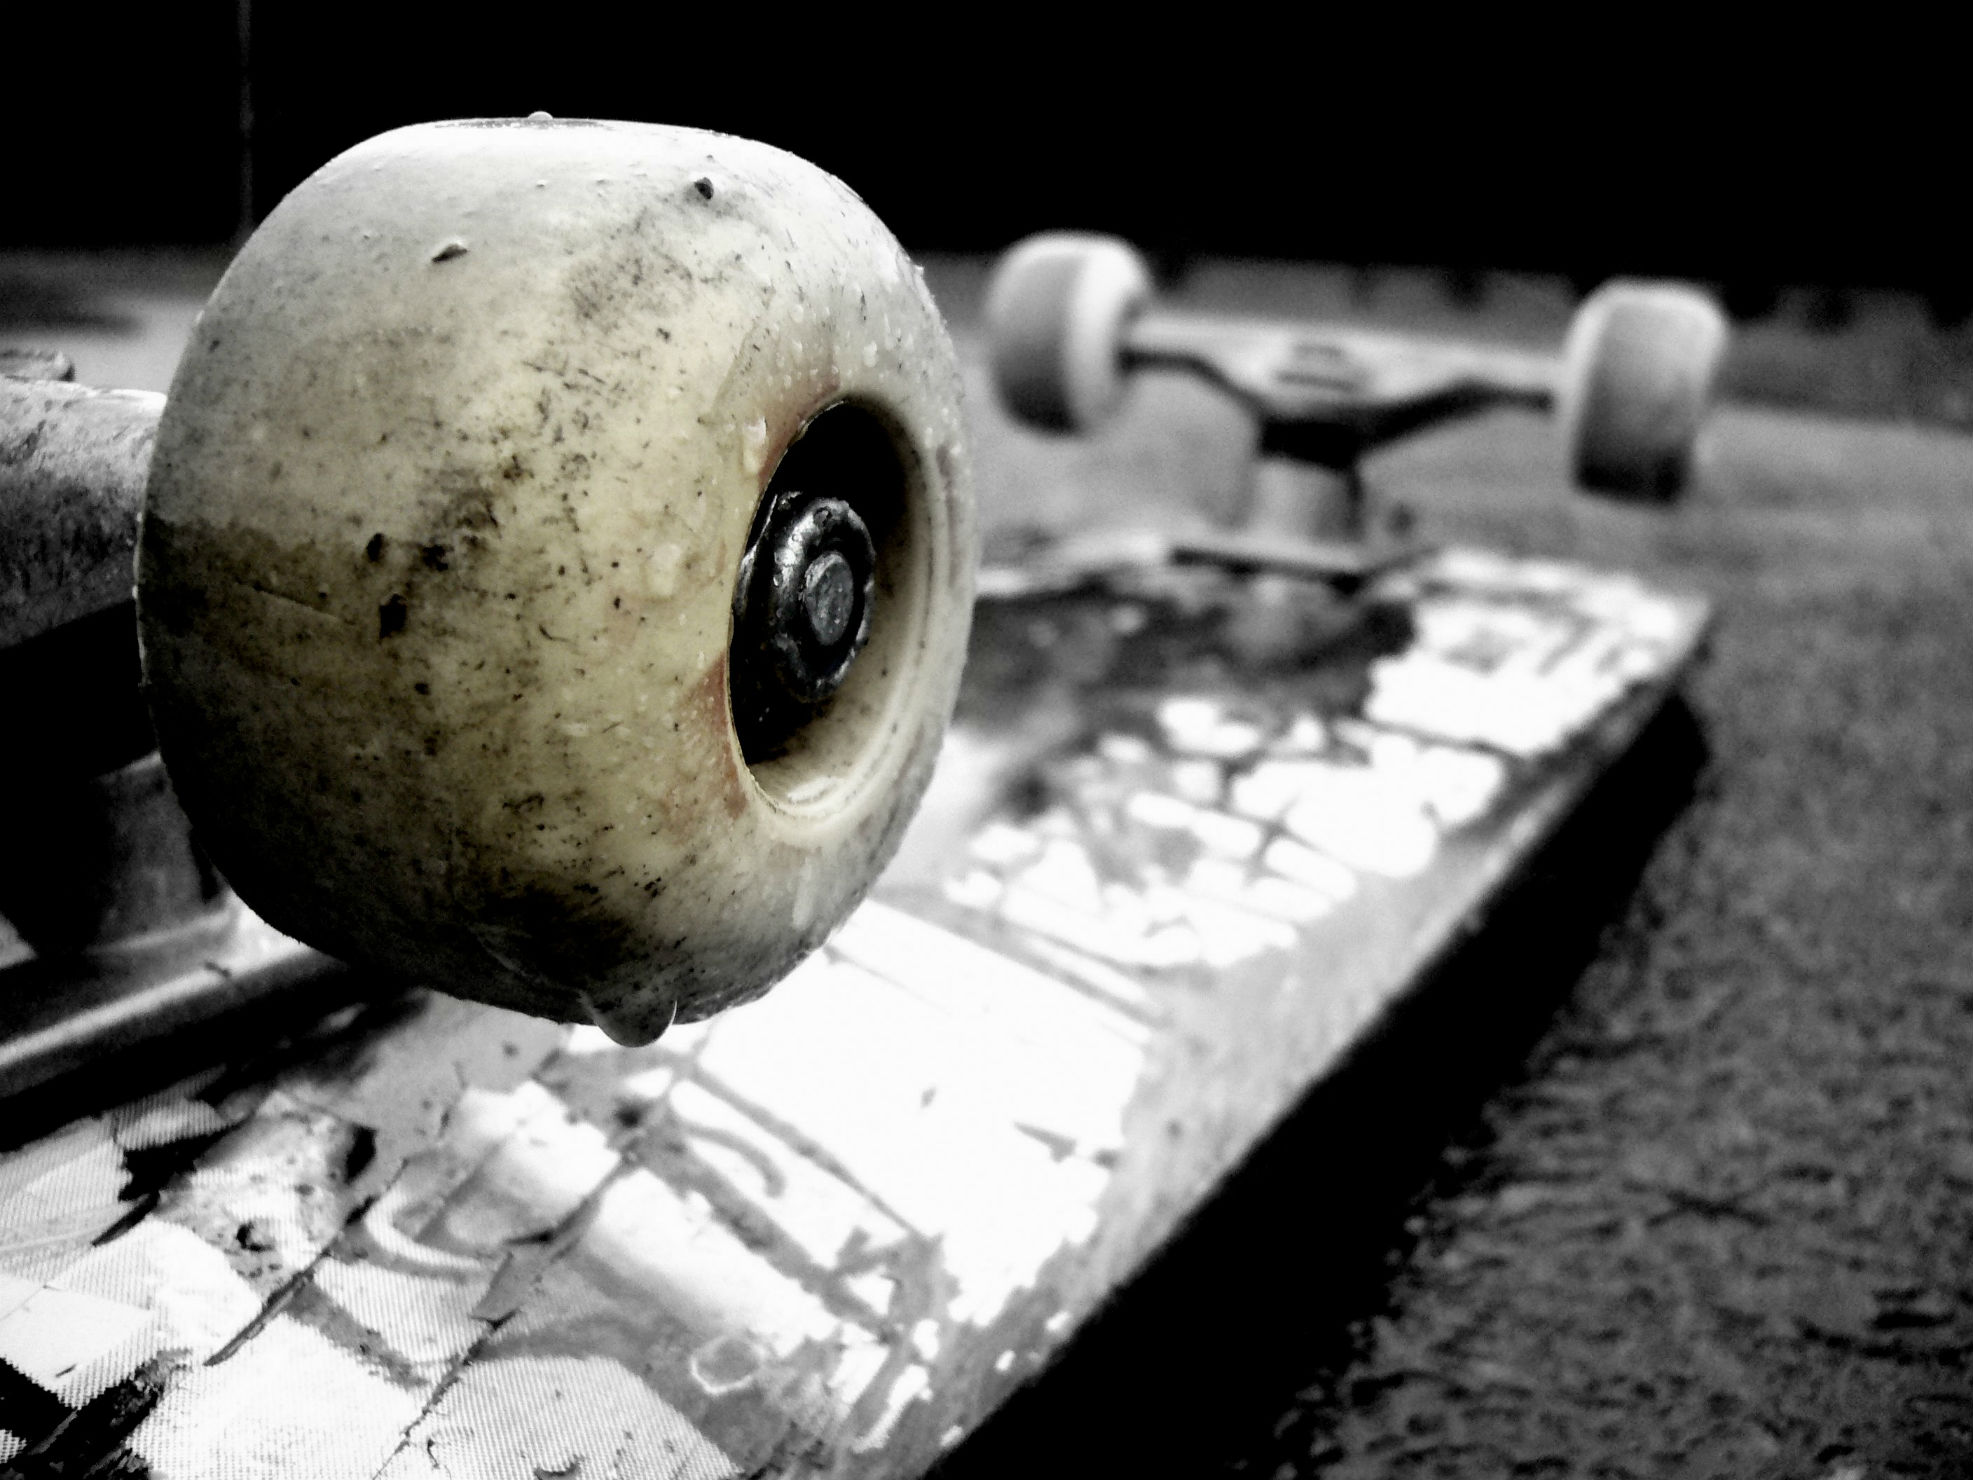 80 Skateboarding HD Wallpapers | Backgrounds - Wallpaper Abyss